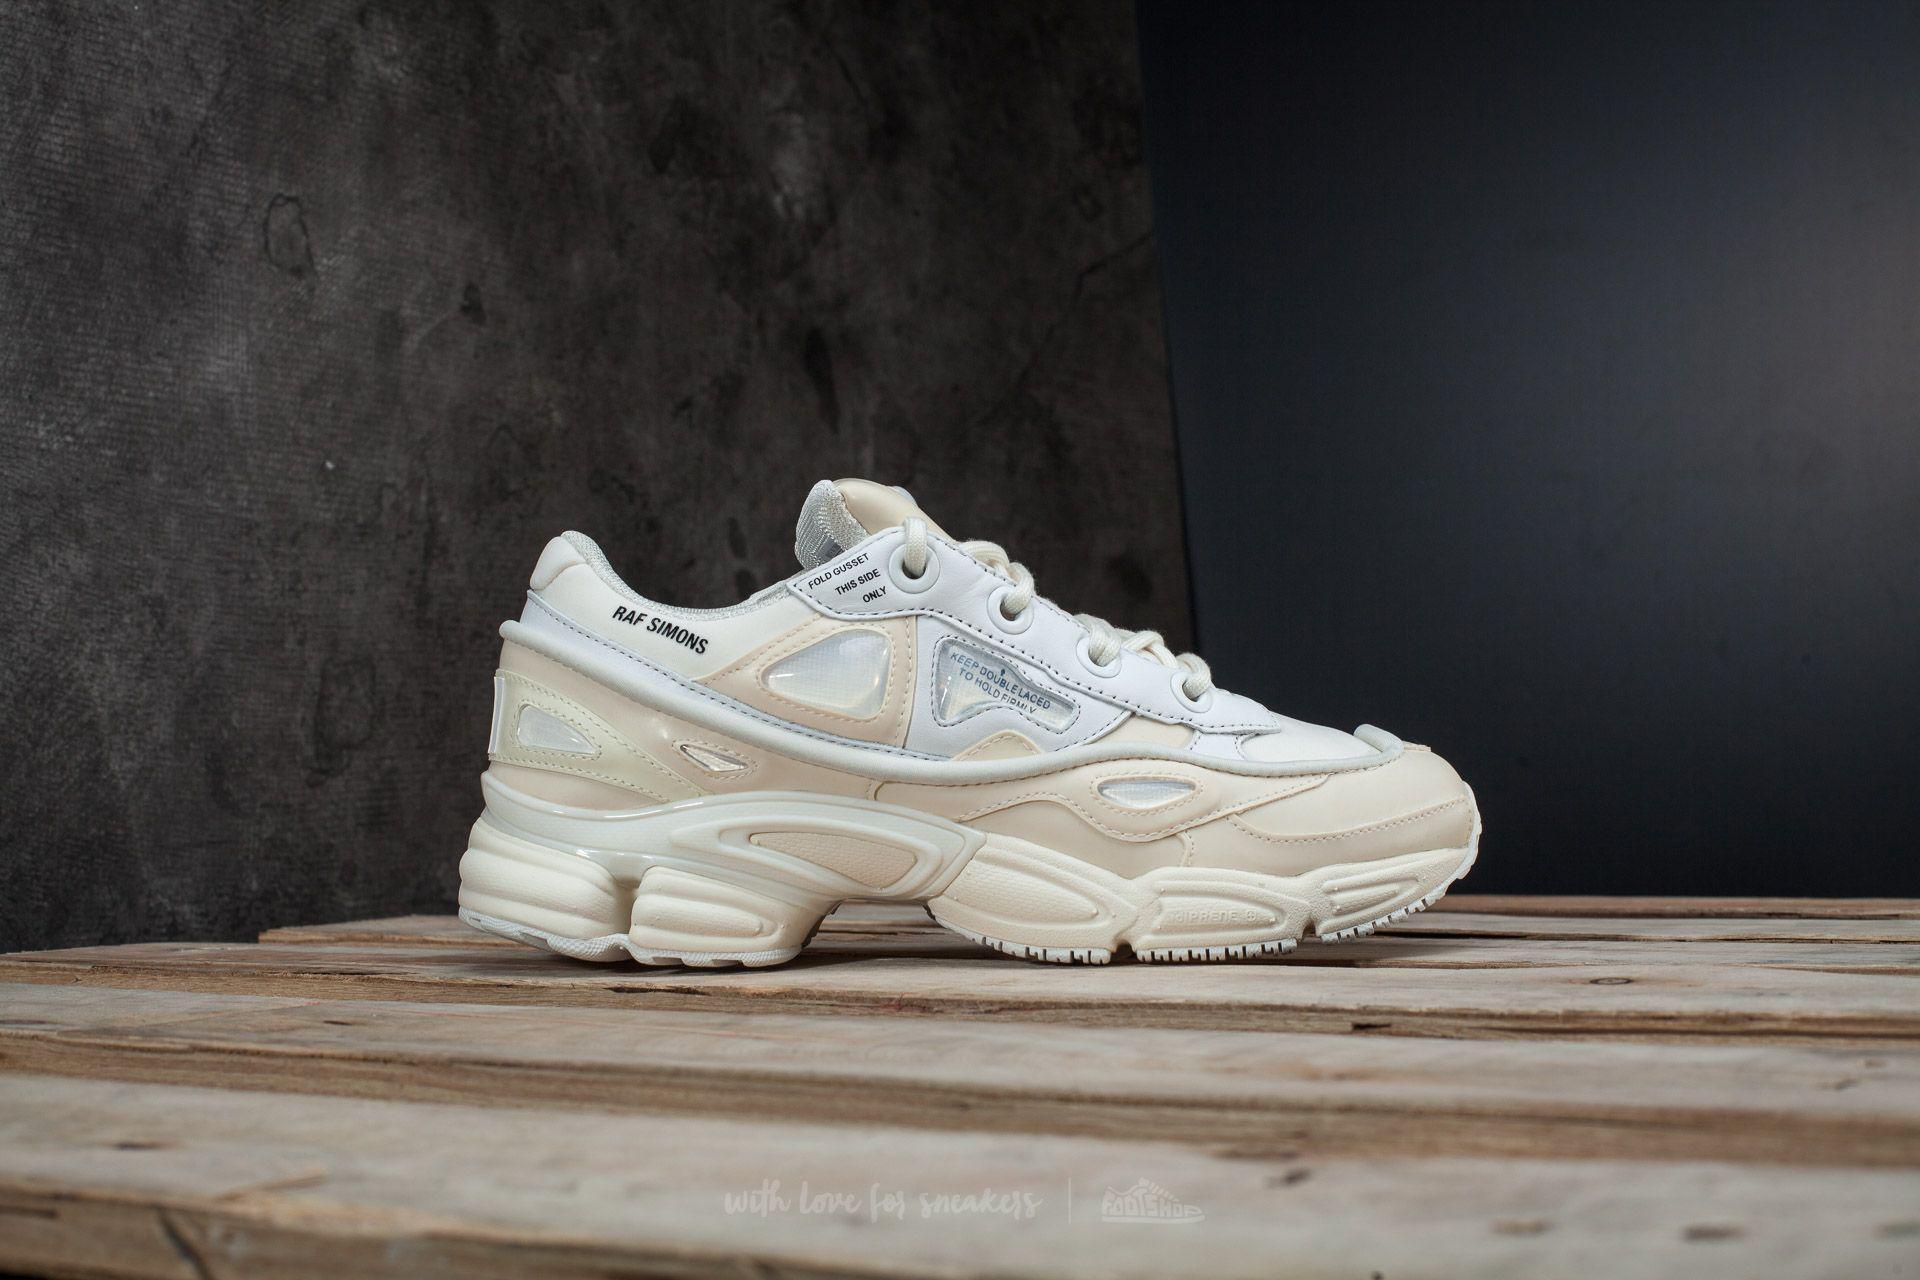 huge selection of 62e72 aa2a8 Lyst - Footshop Adidas X Raf Simons Ozweego Bunny Core White